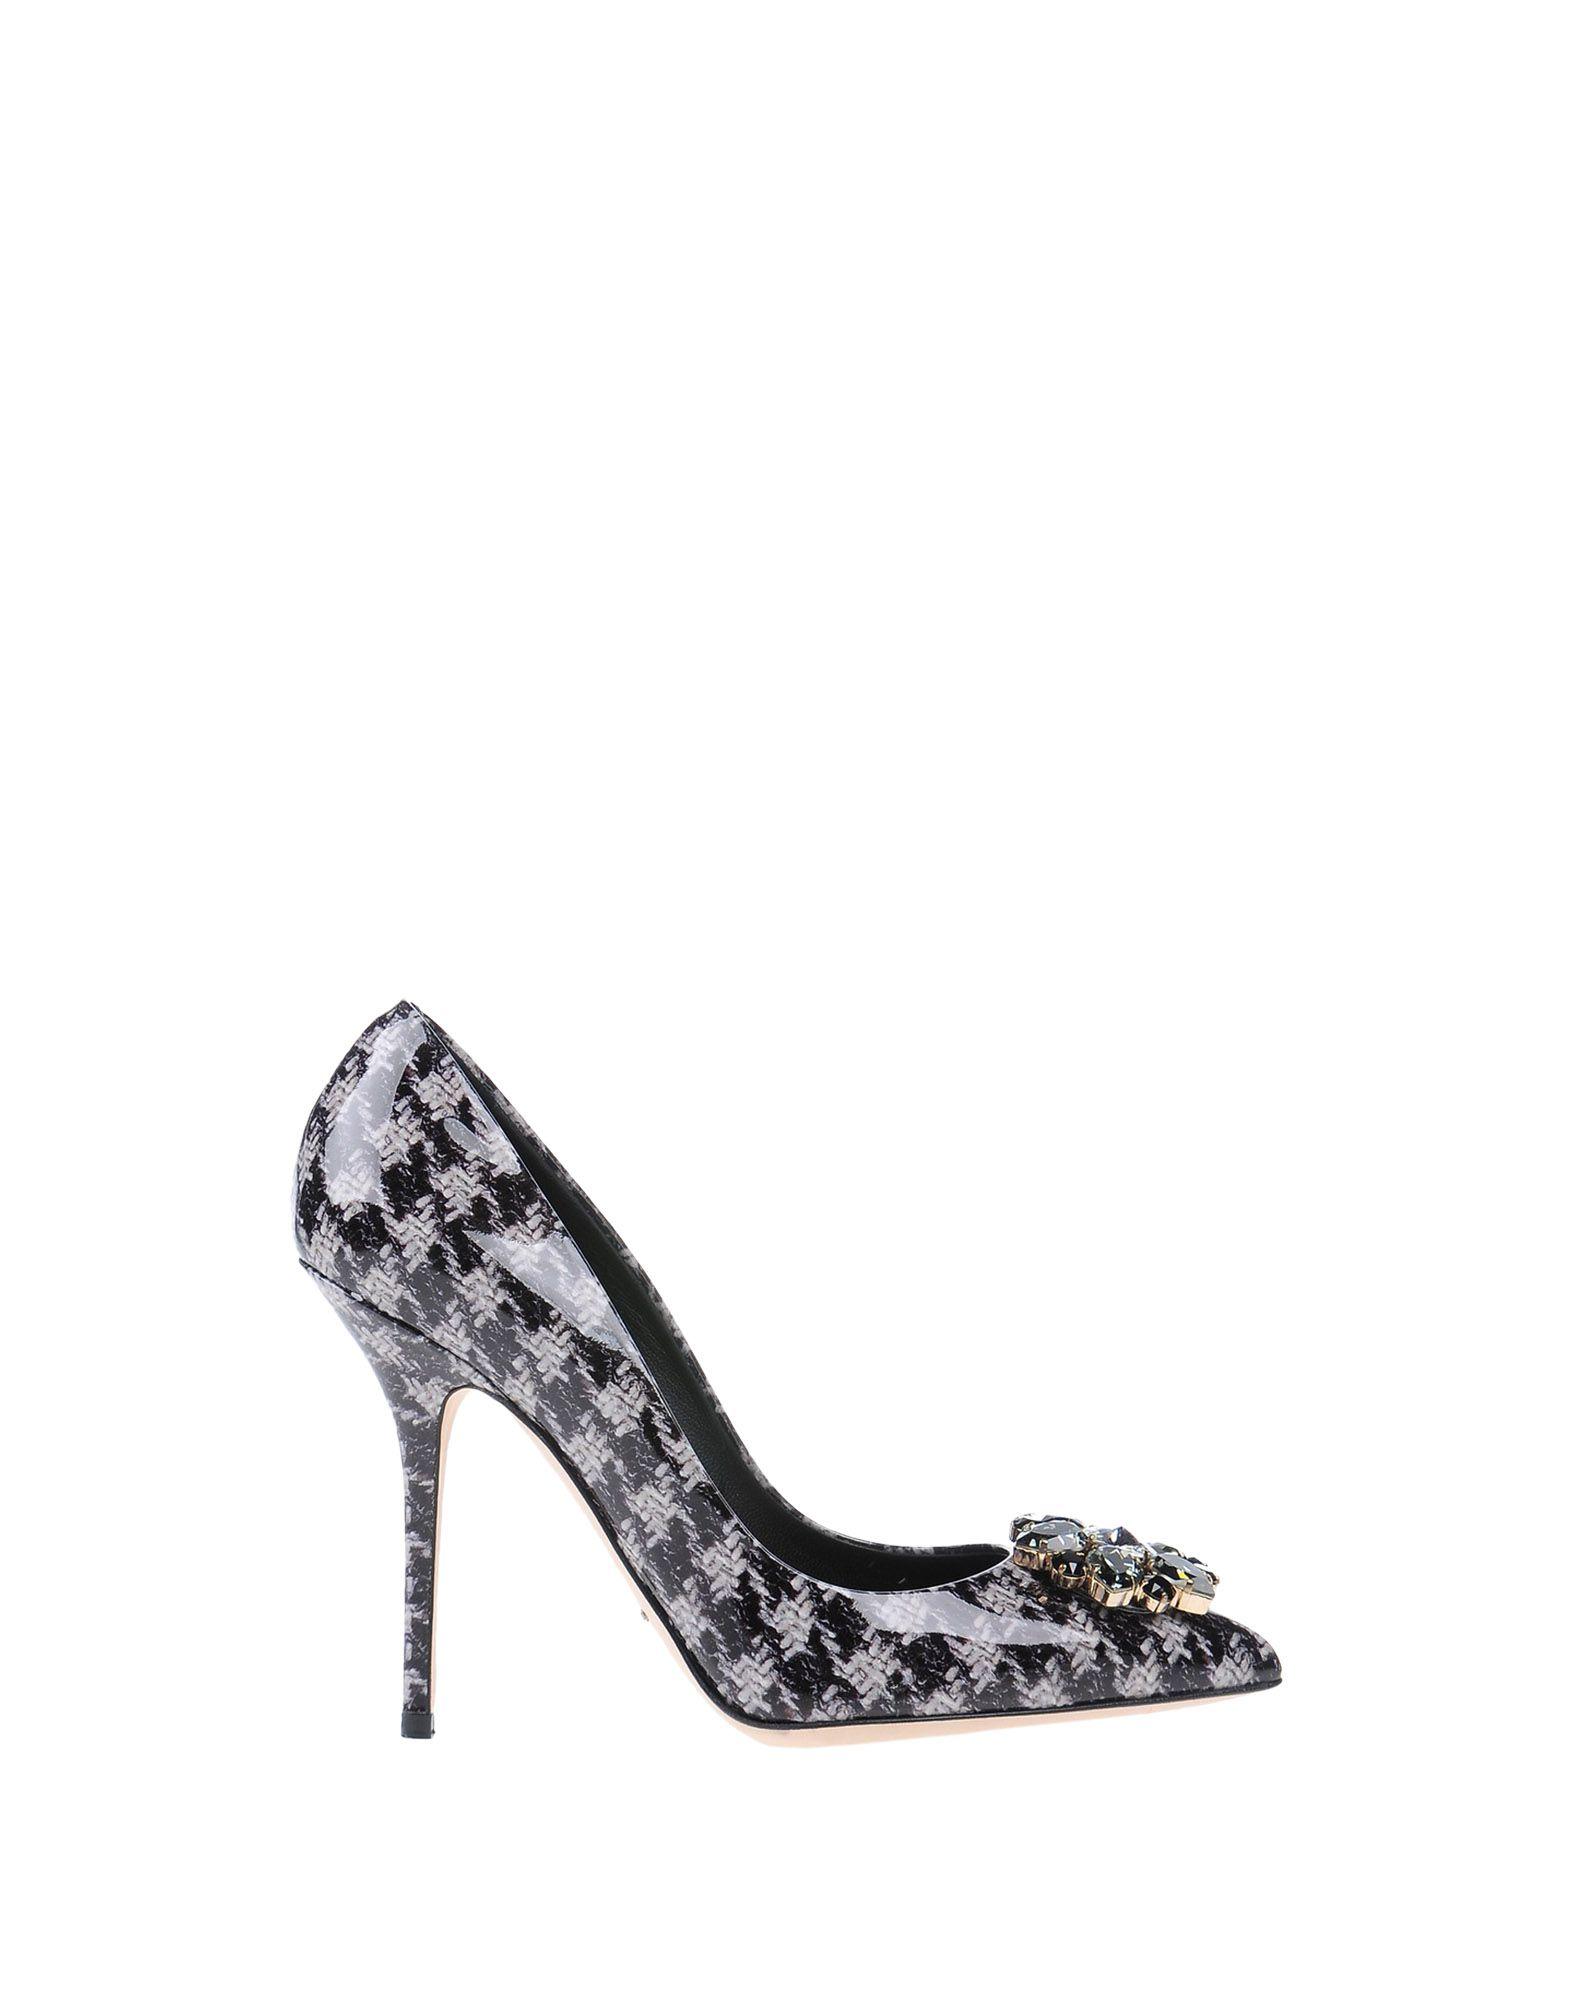 Dolce & Gabbana Pumps Schuhe Damen  11294295OA Neue Schuhe Pumps 3bafc2